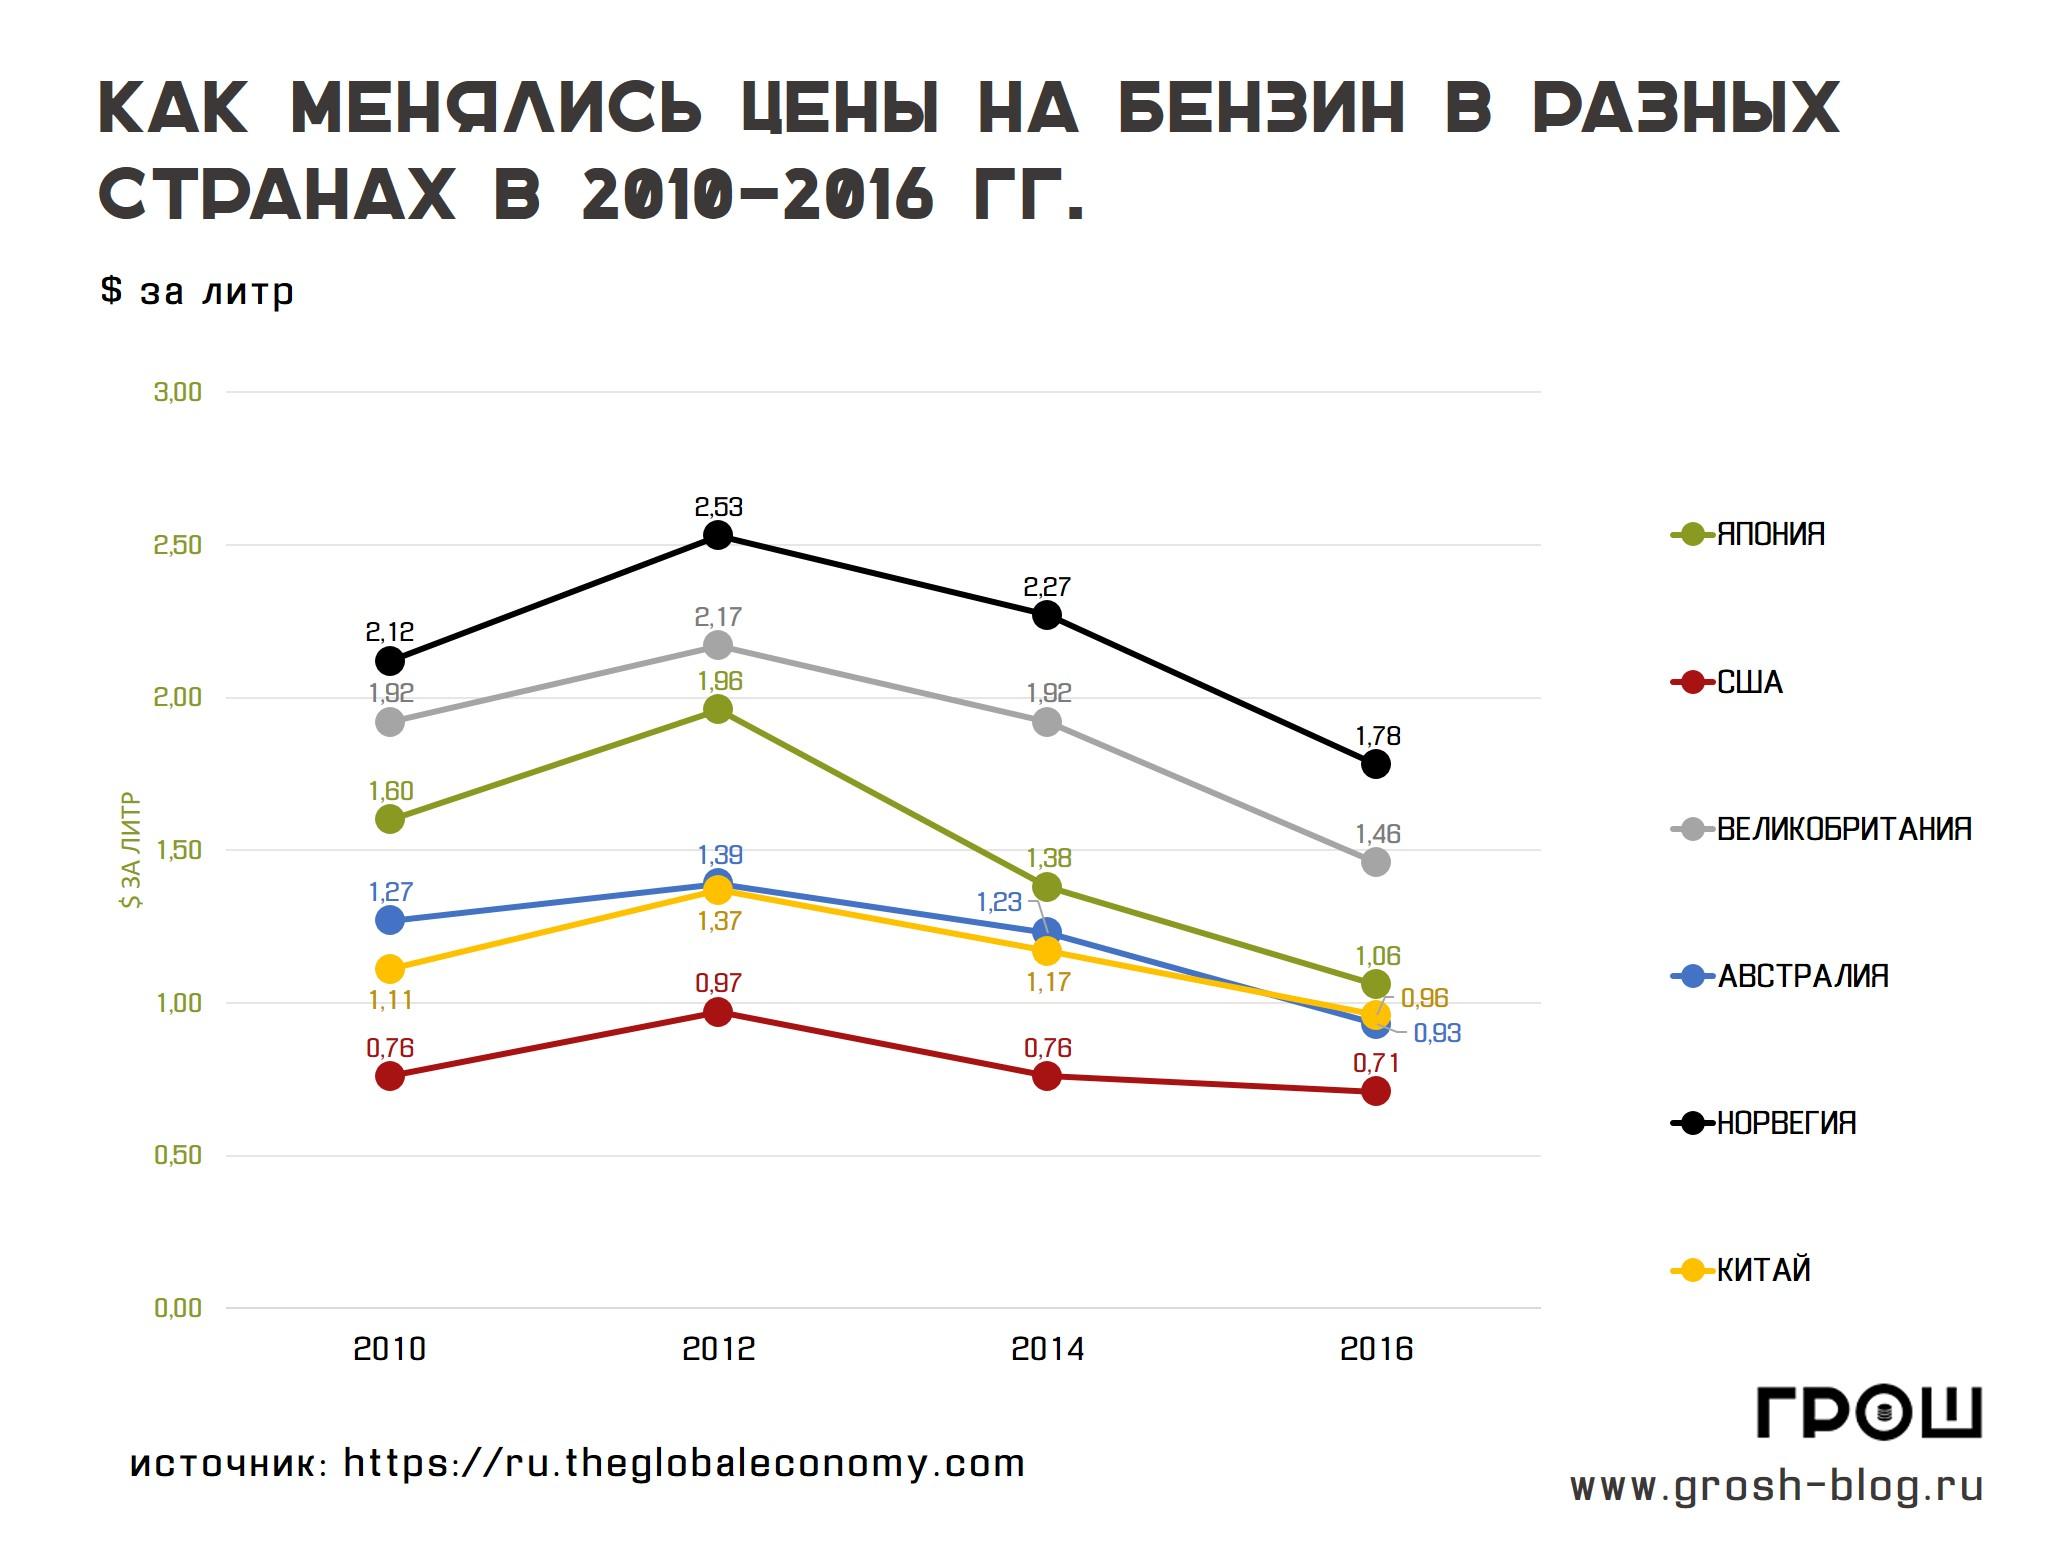 динамика цен на бензин в разных странах http://grosh-blog.ru